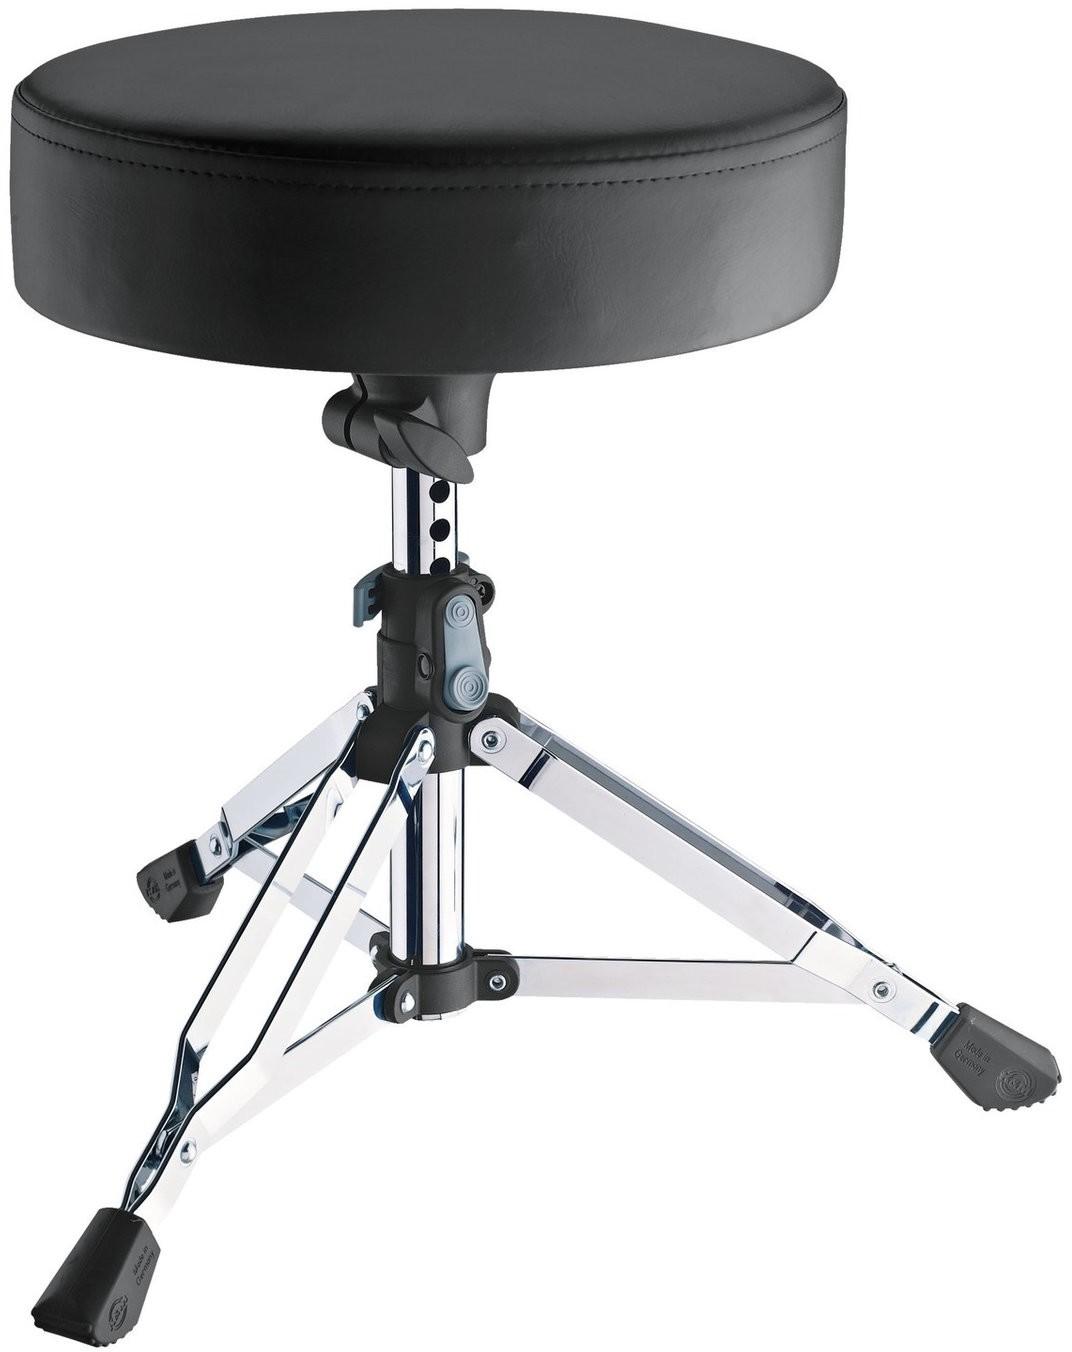 Konig & Meyer 14010 Drummer Throne Piccolino Chrome